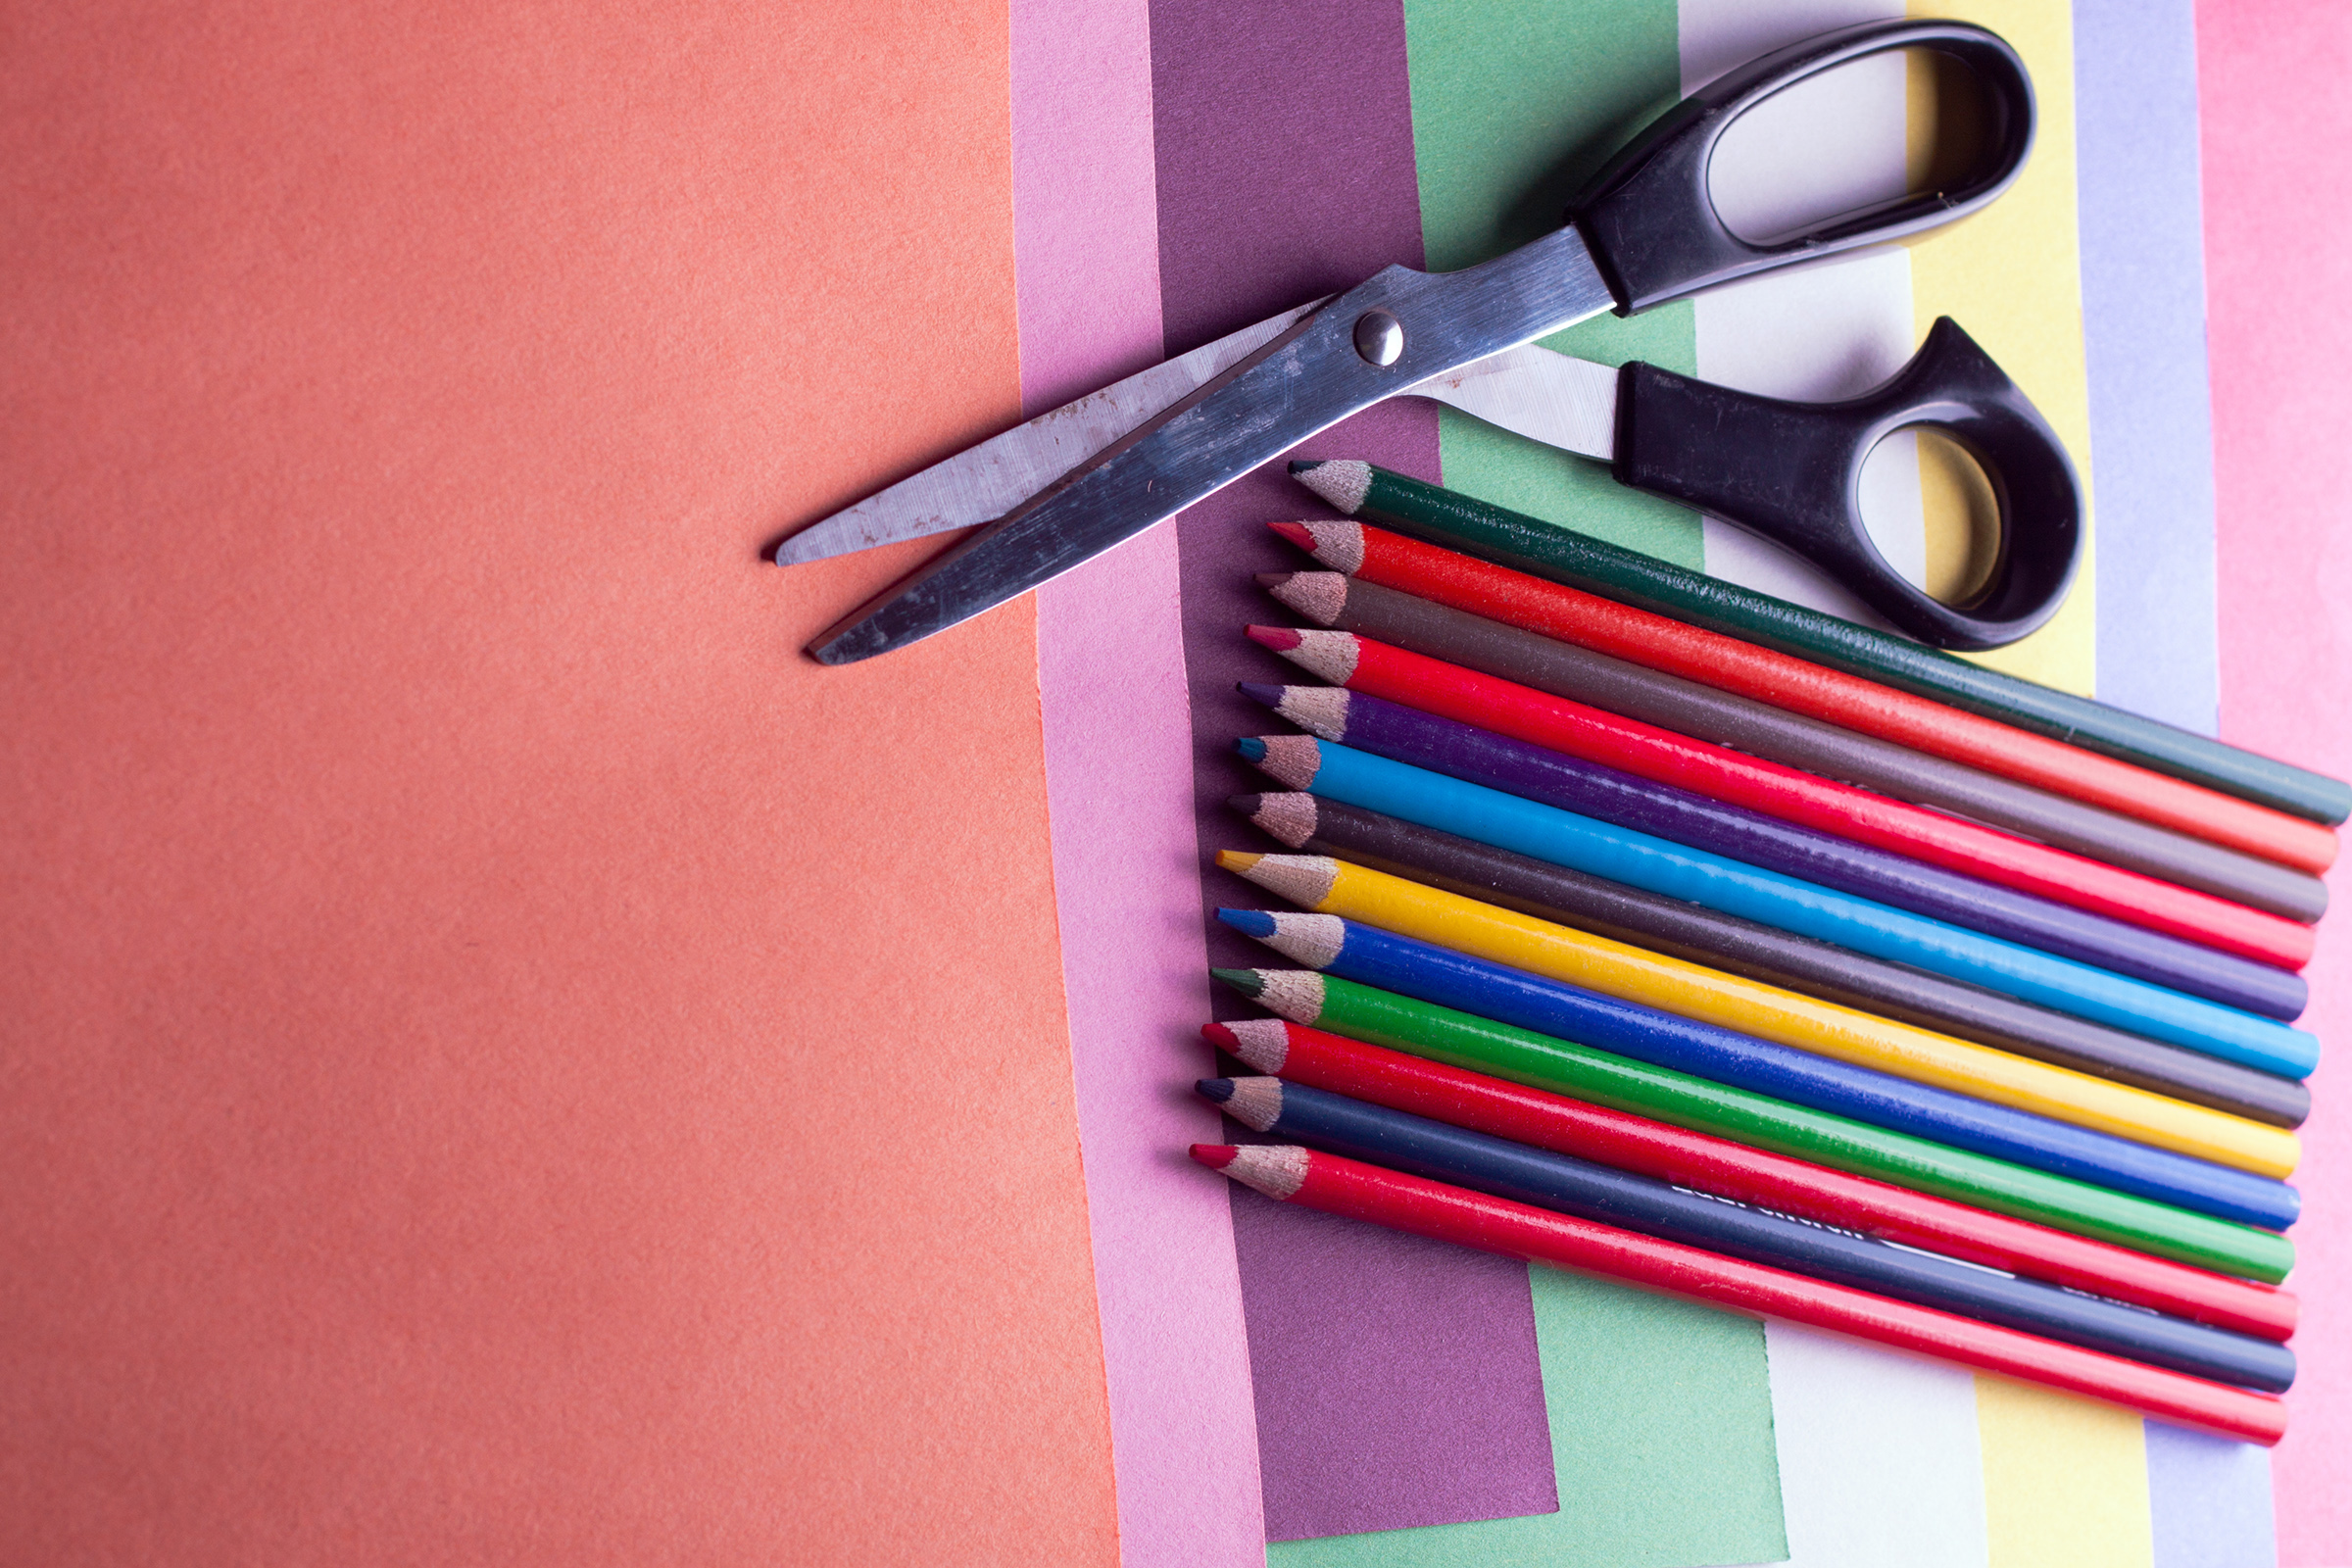 Art Supplies, Art, Nobody, Objects, Obsolette, HQ Photo